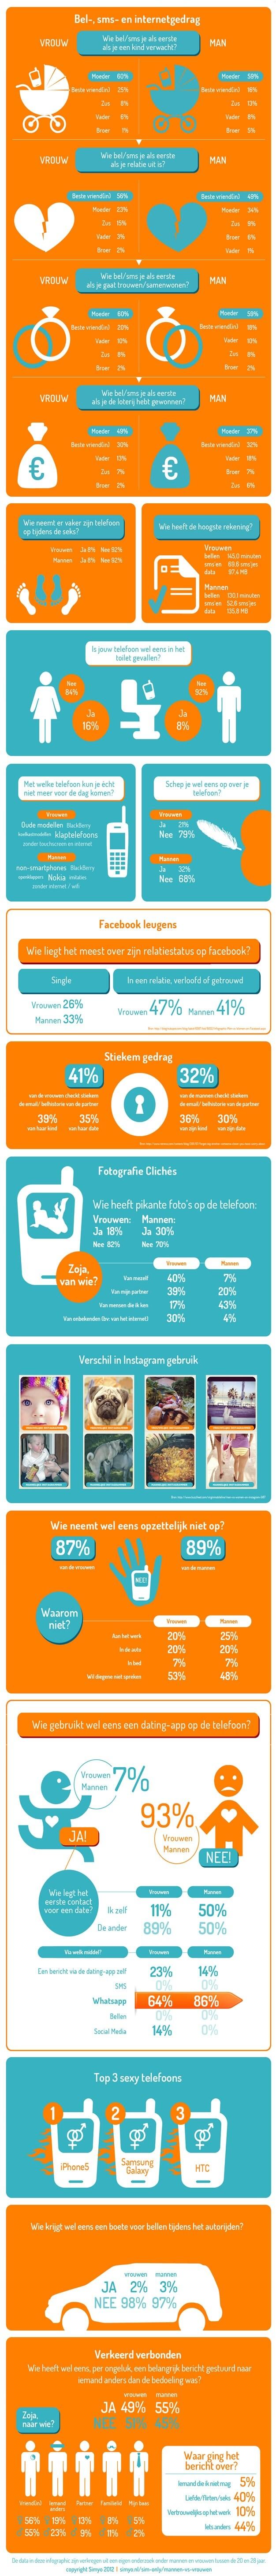 Simonly-Mannen-VS-Vrouwen-Infographic-Simyo